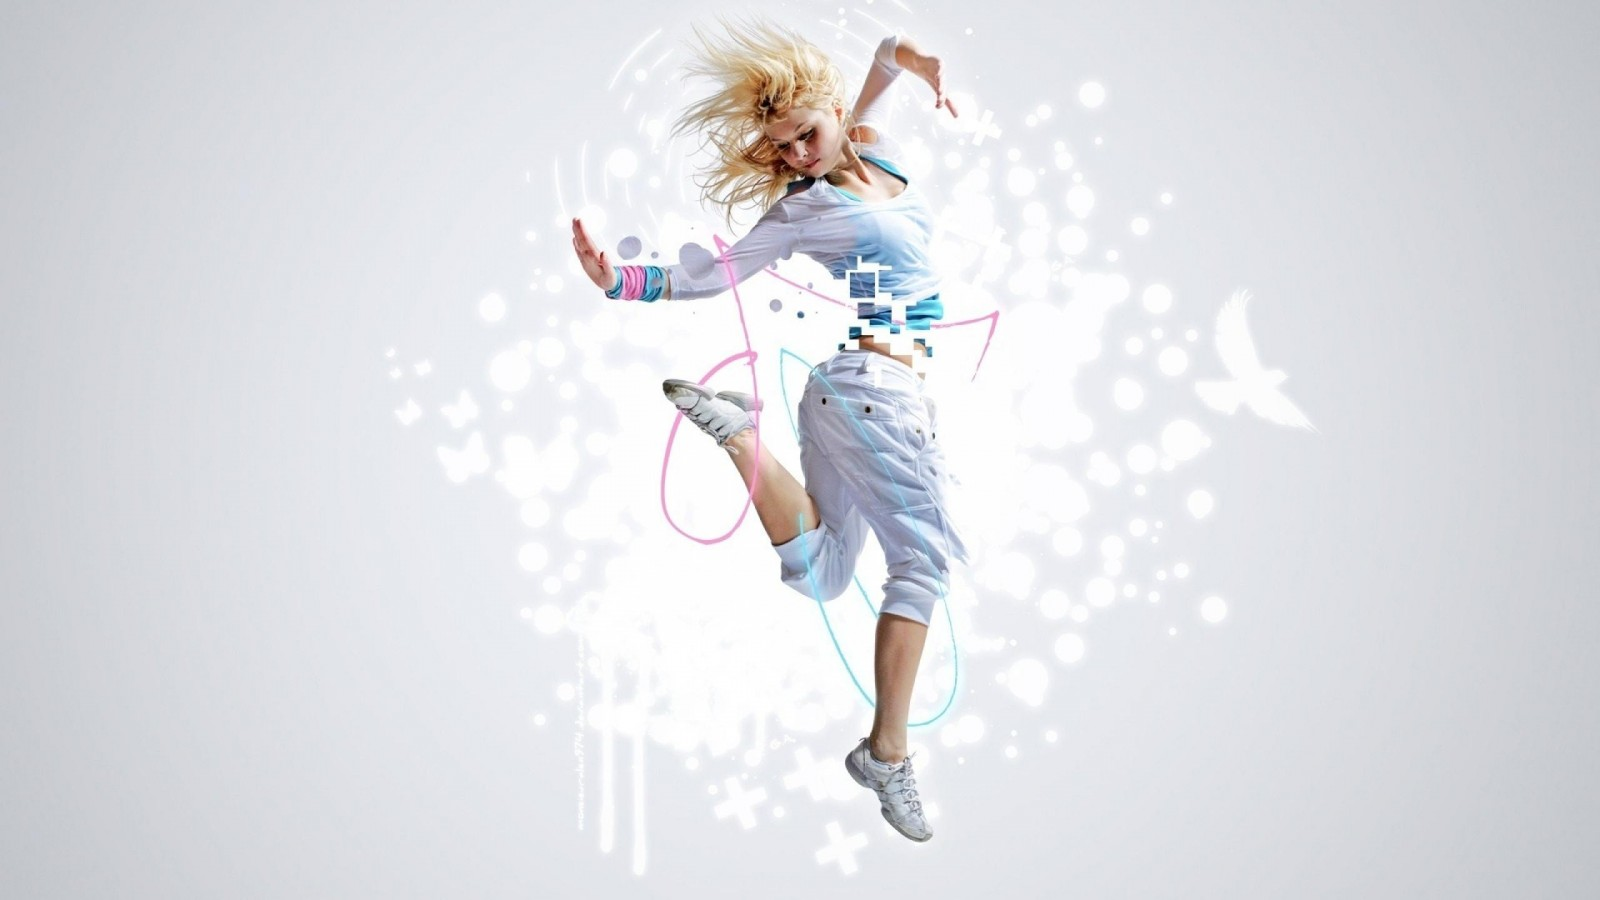 Dance Leap Movement Freedom Music Rhythm Girl Dancer    HD HD Wallpaper